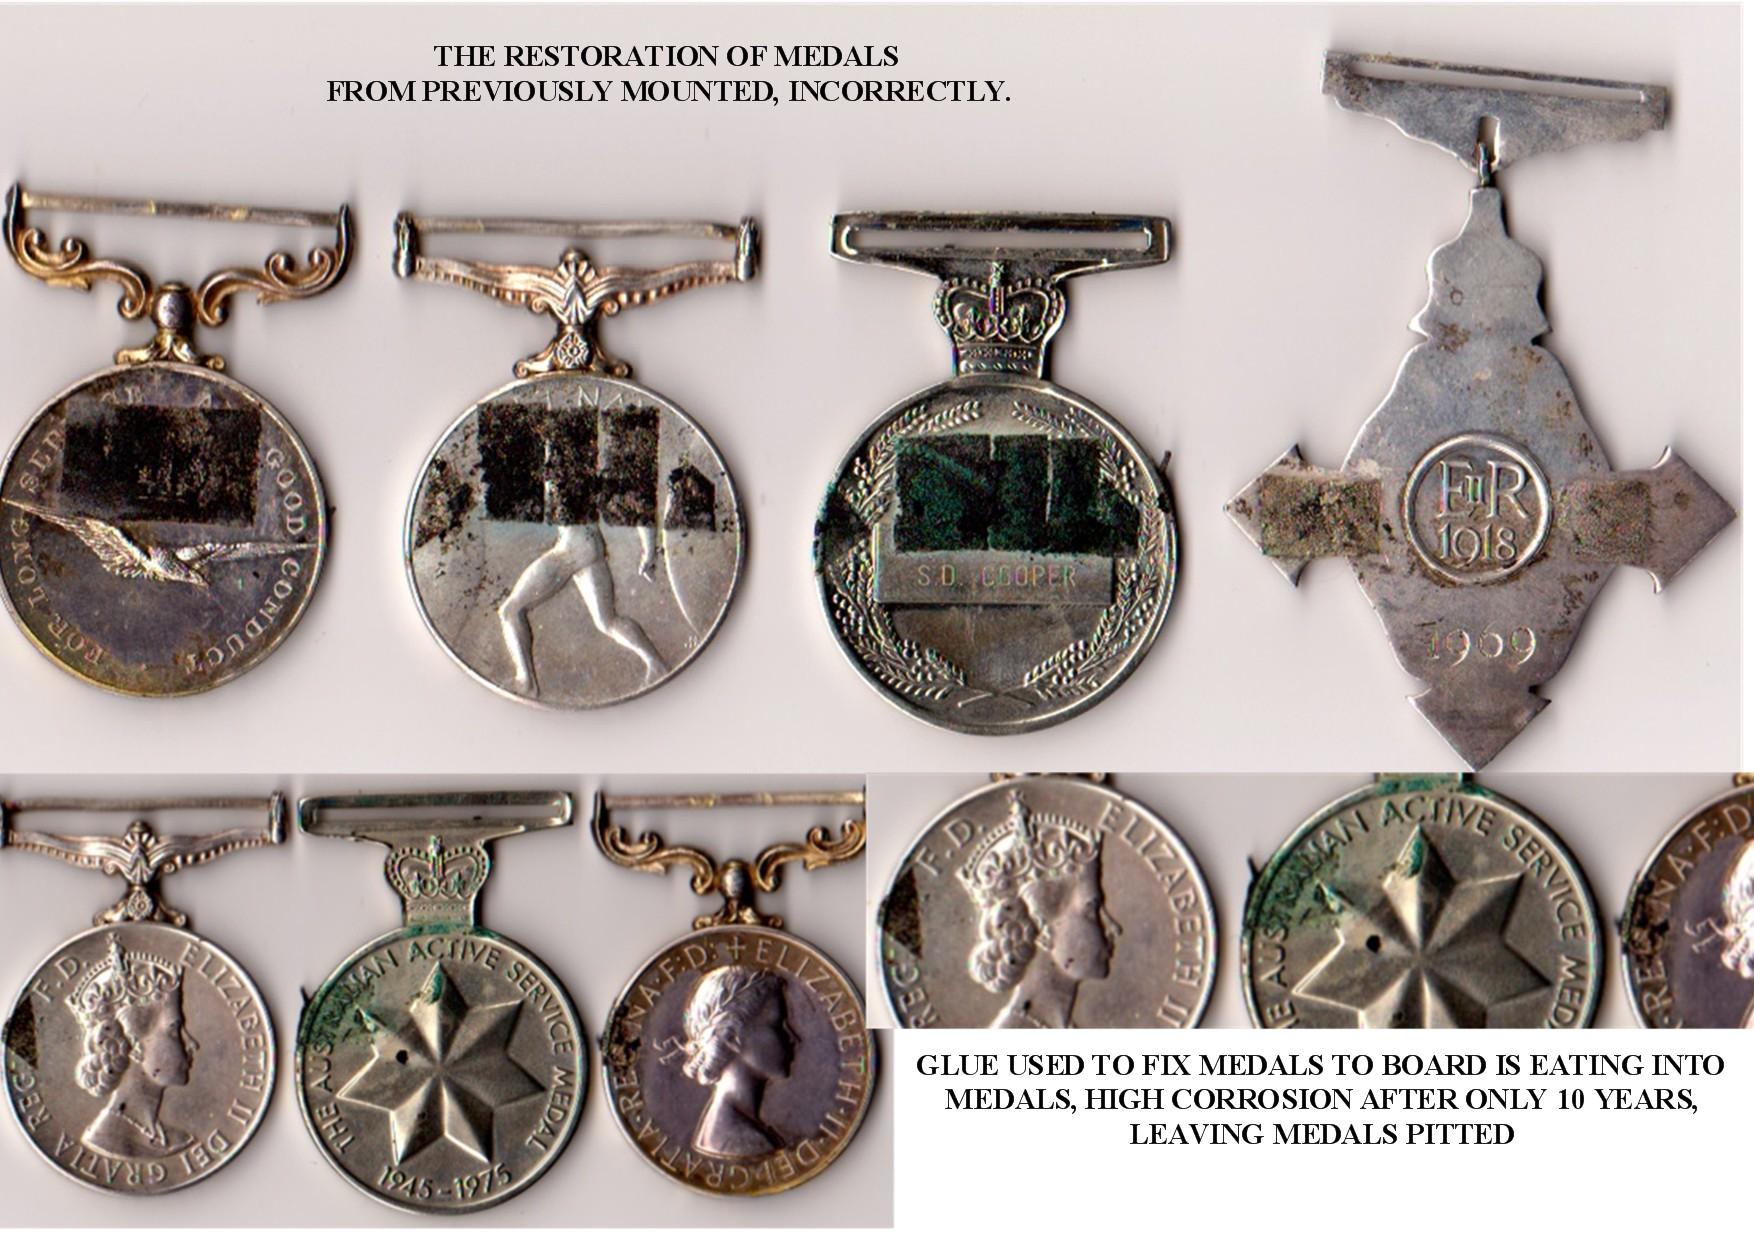 Medals before restoration